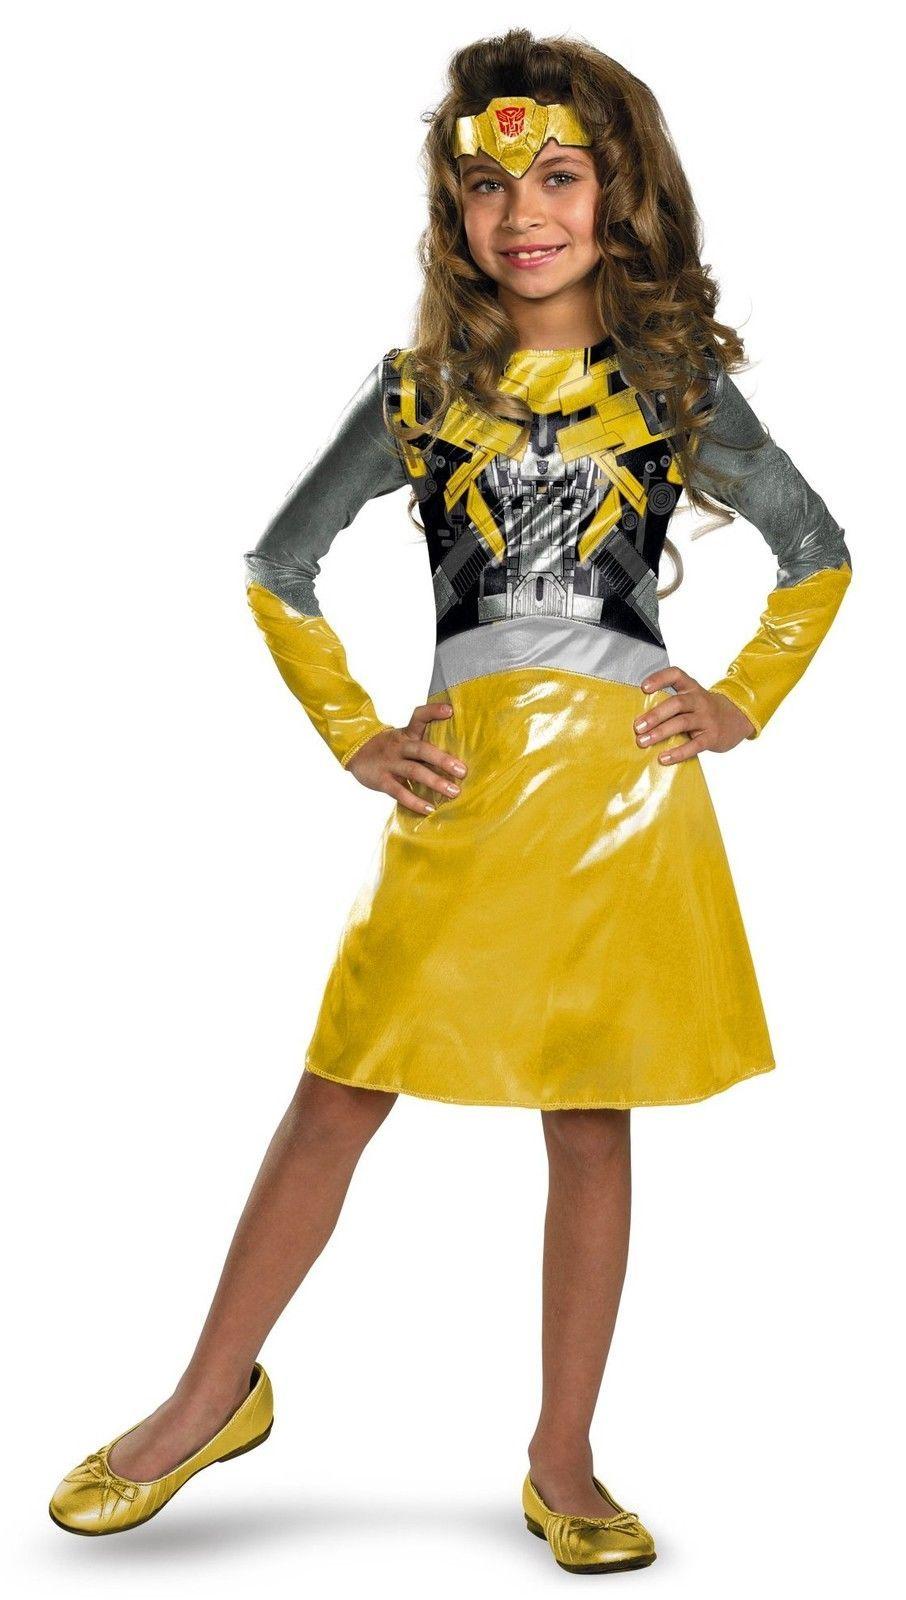 Girls Transformers Bumblebee Kids Halloween Costume | eBay  sc 1 st  Pinterest & Girls Transformers Bumblebee Kids Halloween Costume | eBay | Lillys ...